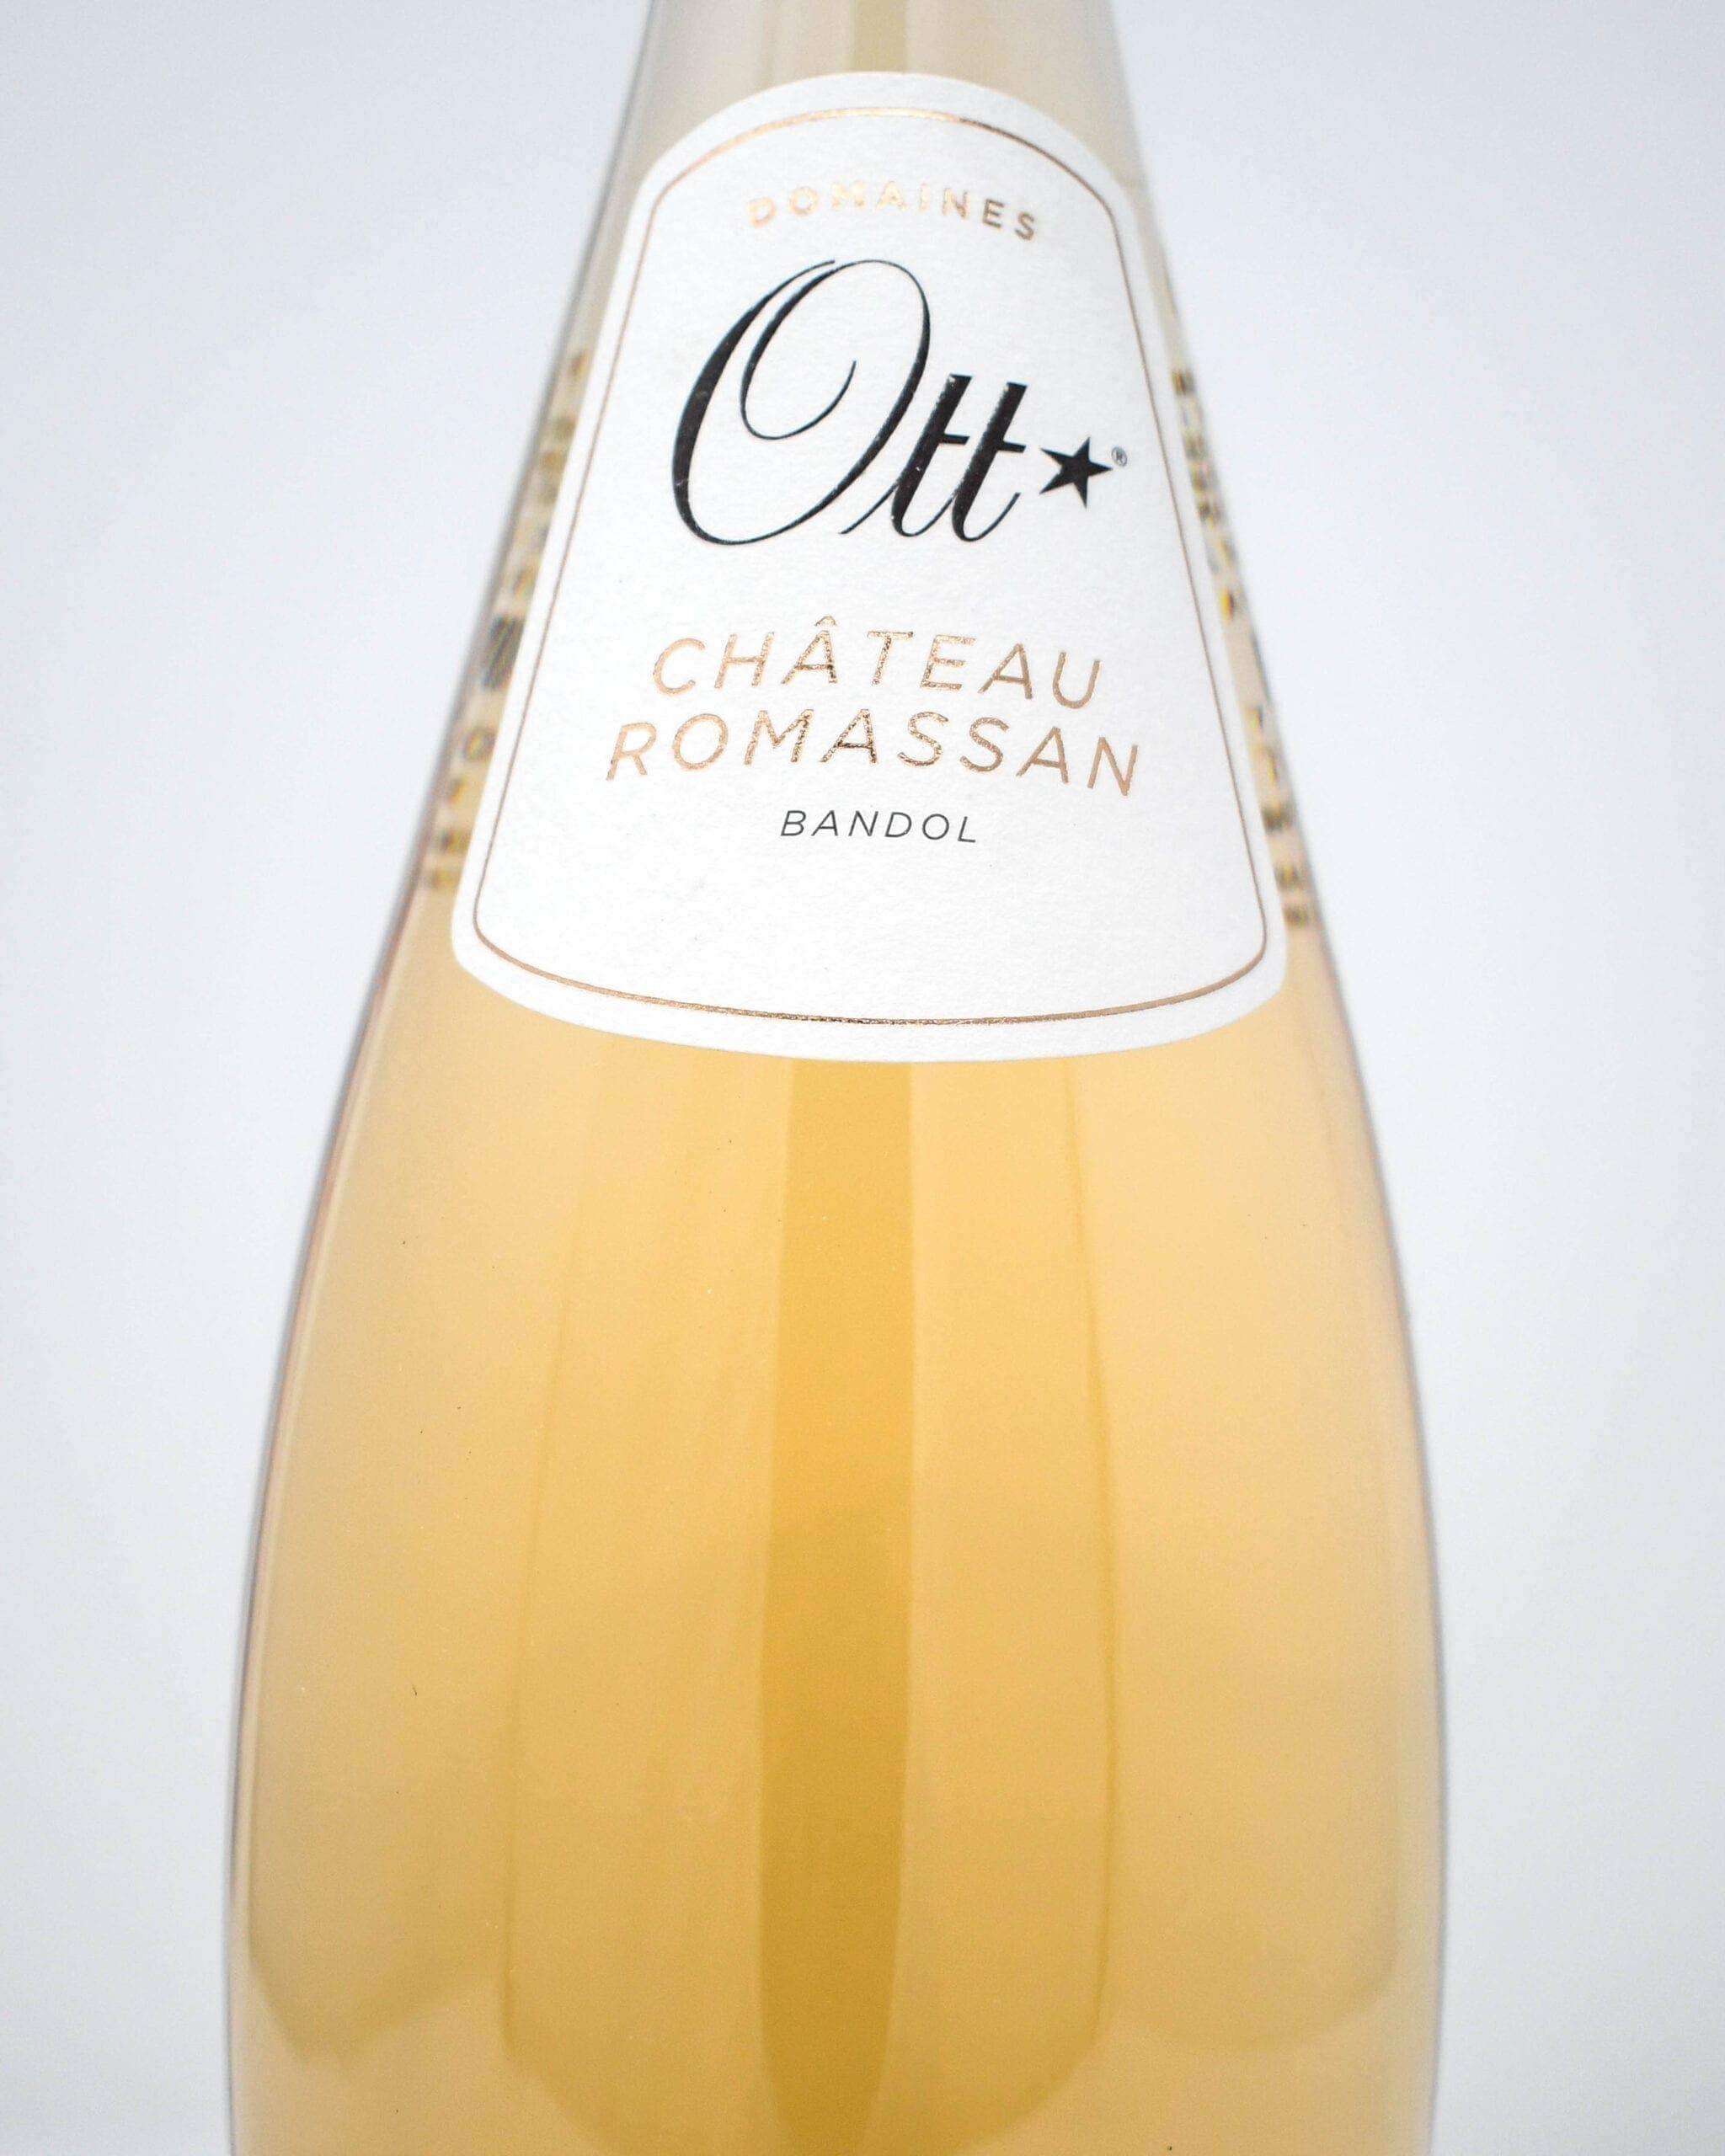 Domaines Ott Romassan Bandol Rose 2018